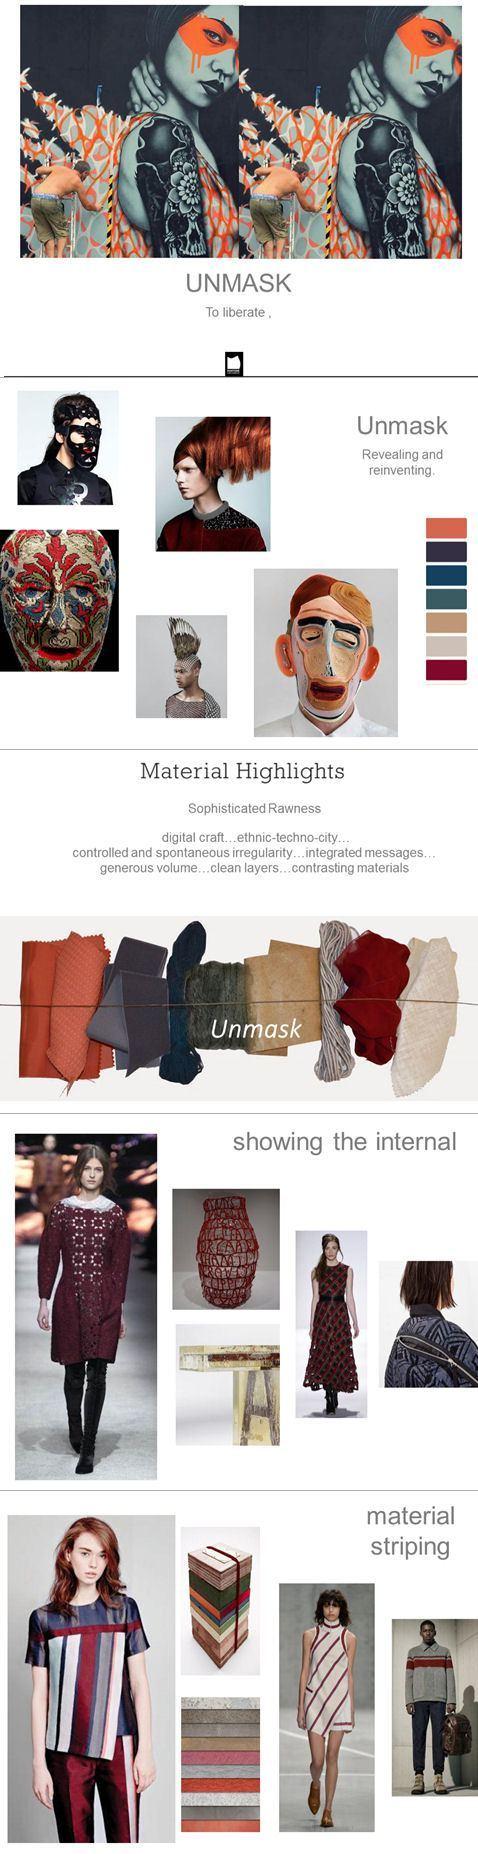 fall winter 2016 2017 color trends from pantone blue bergitt. Black Bedroom Furniture Sets. Home Design Ideas